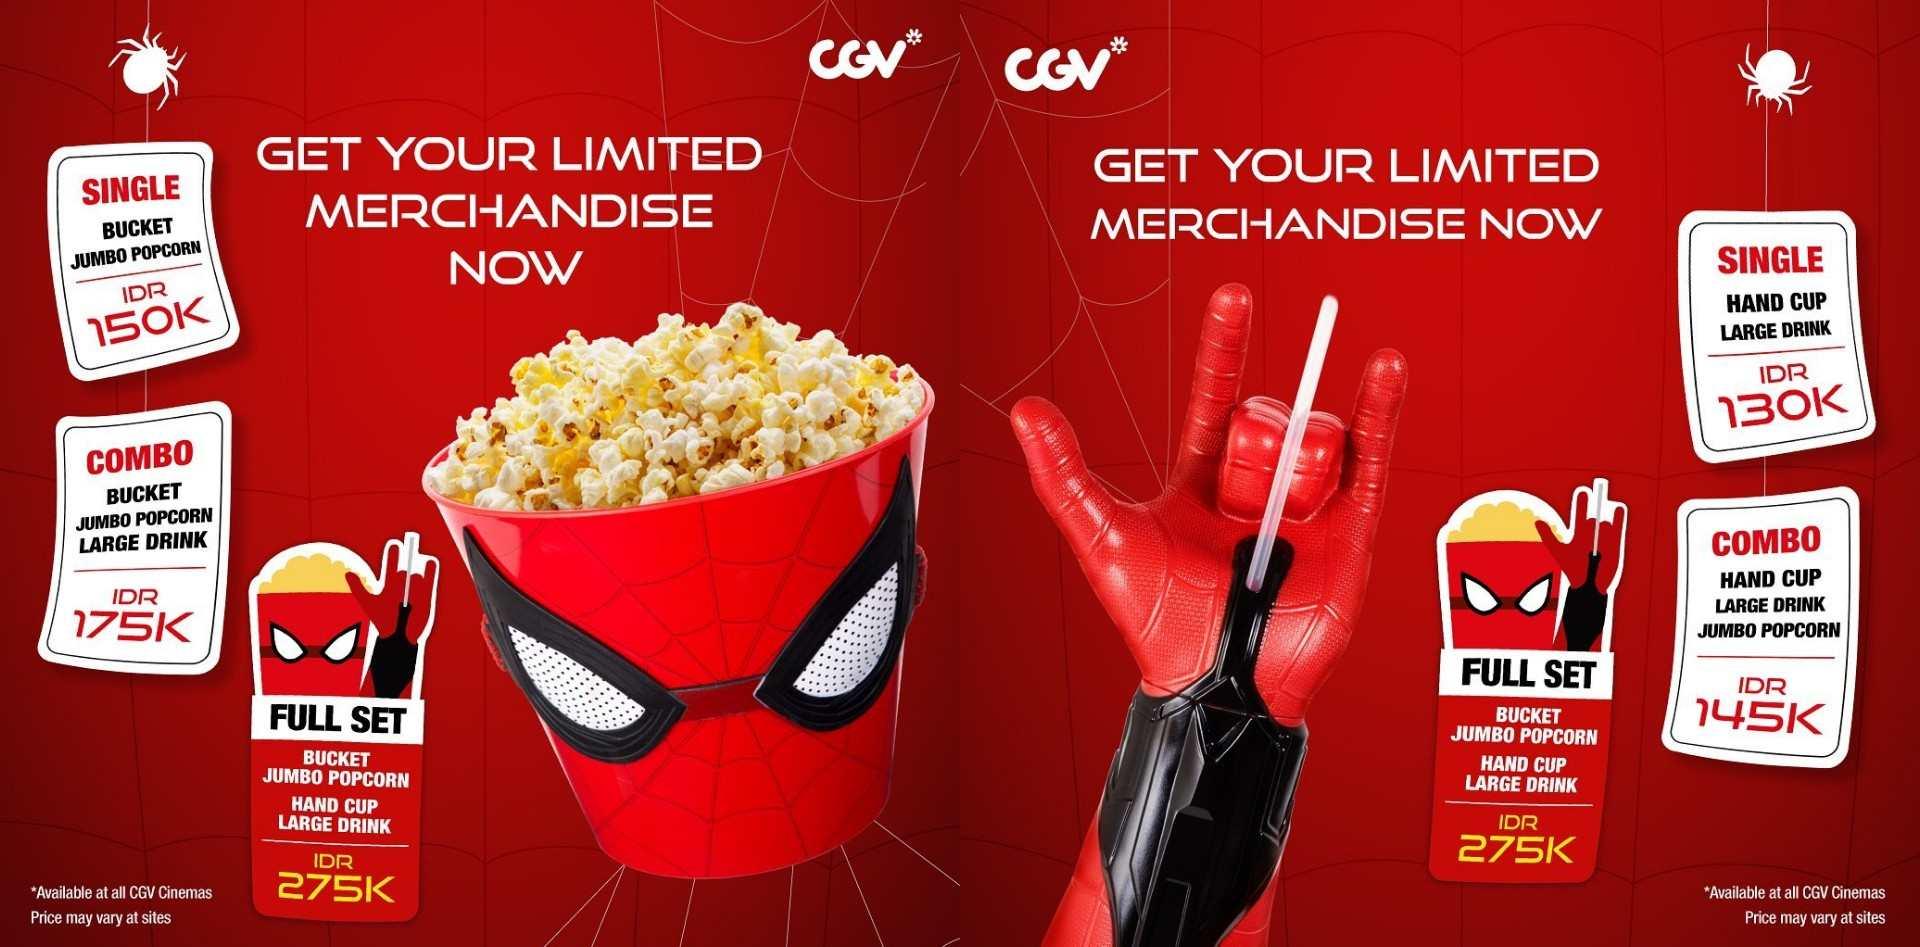 Diskon CGV Promo Exclusive Merchandise Spider-Man Far From Home, Harga mulai Rp.120.000